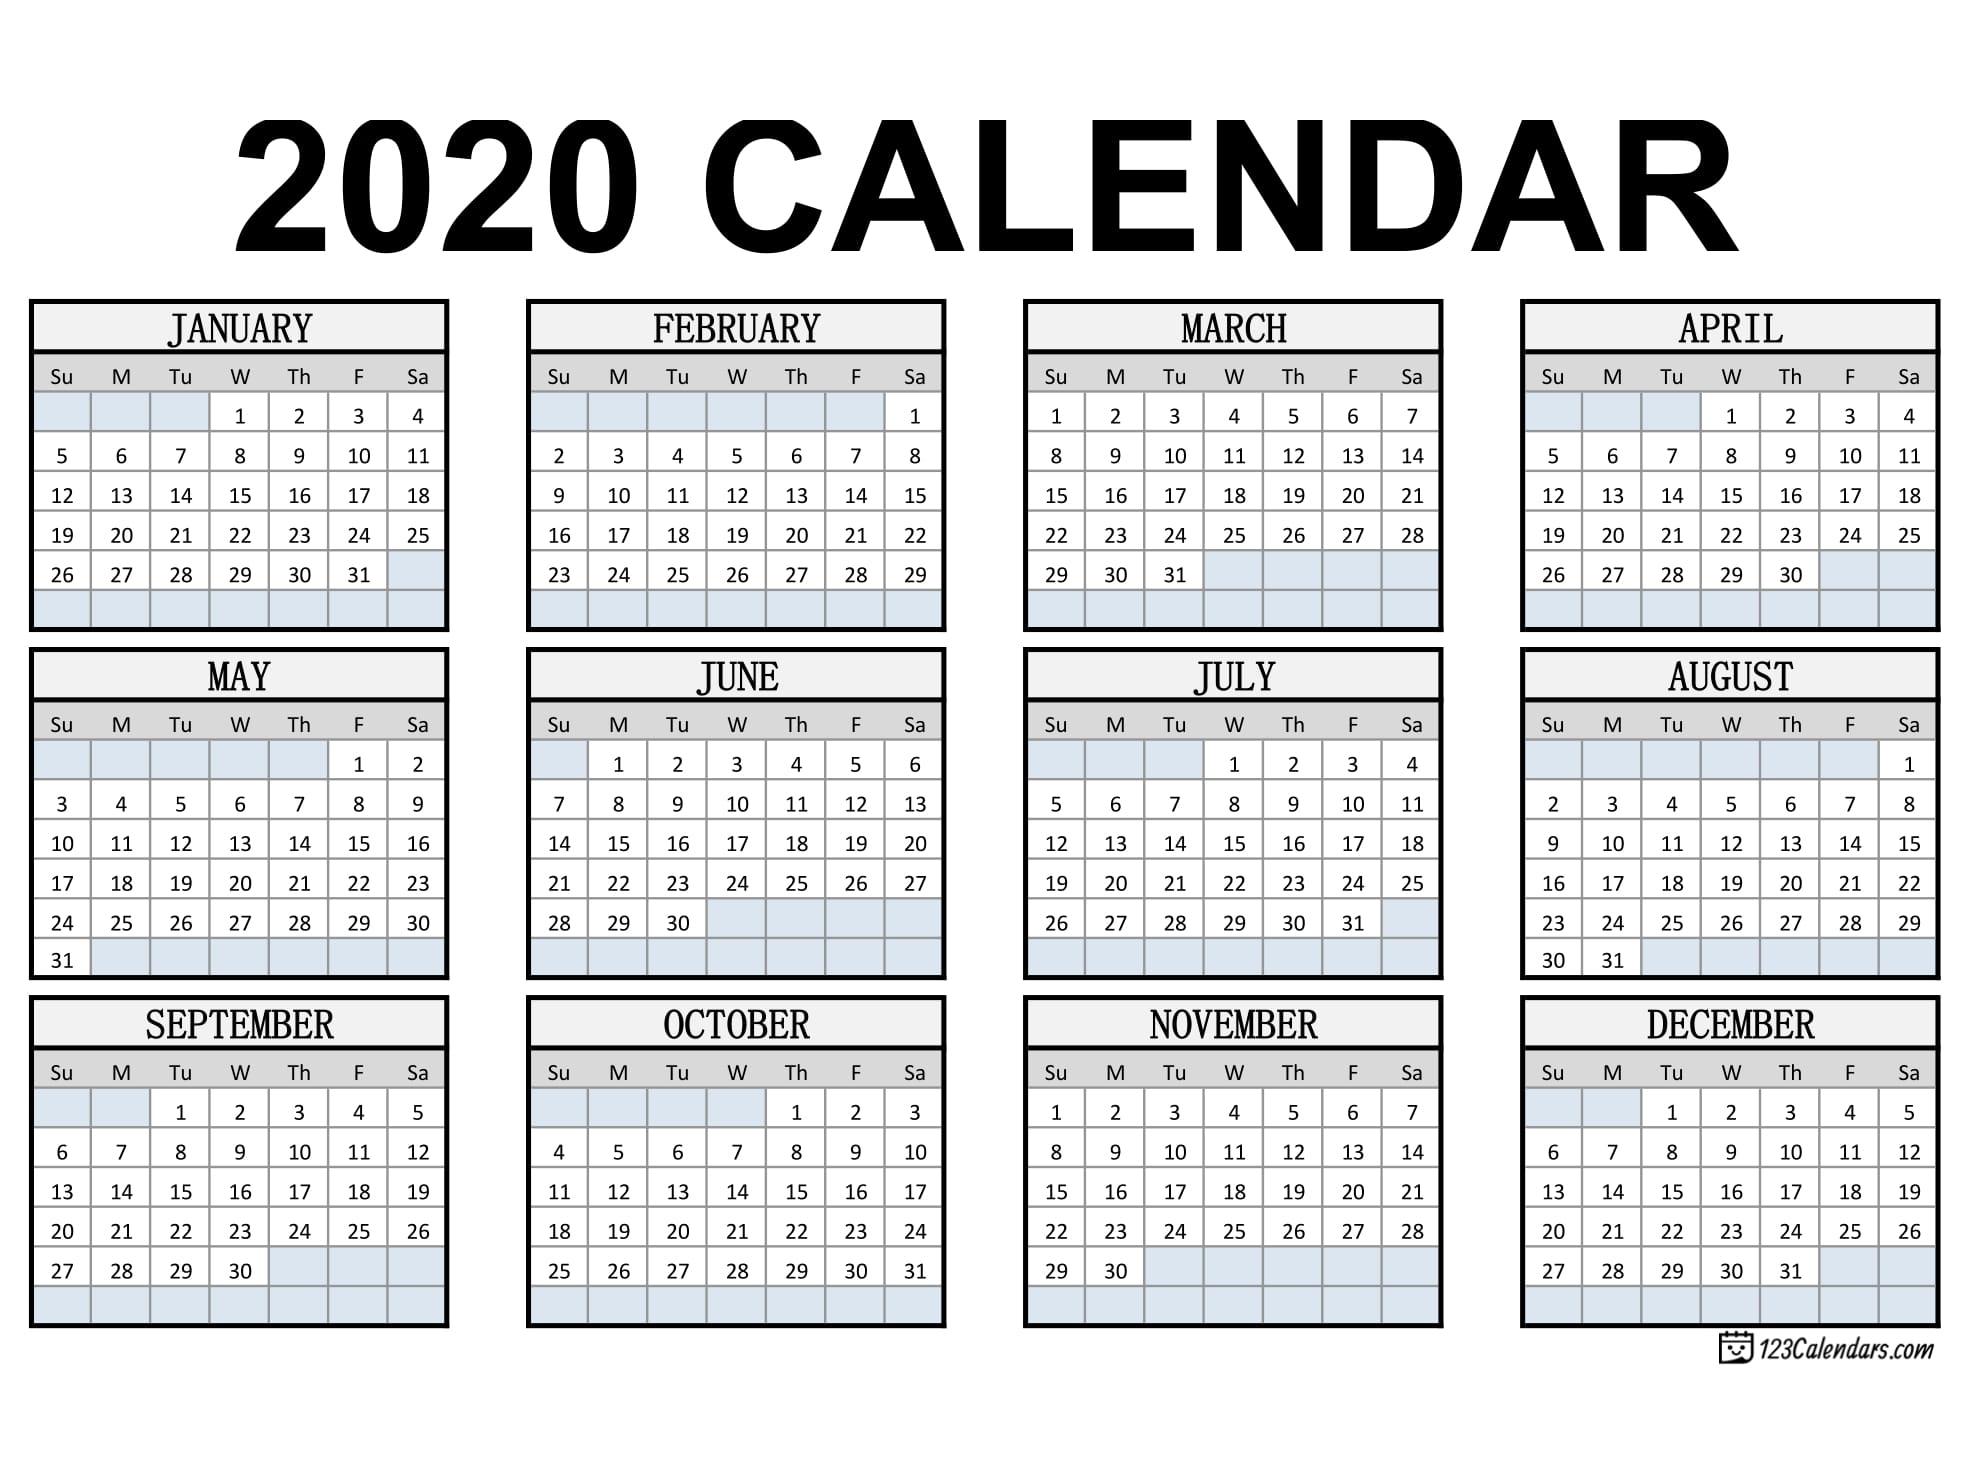 Free Printable 2020 Calendar | 123Calendars intended for Free Printable Pocket Size Calendars 2019-2020